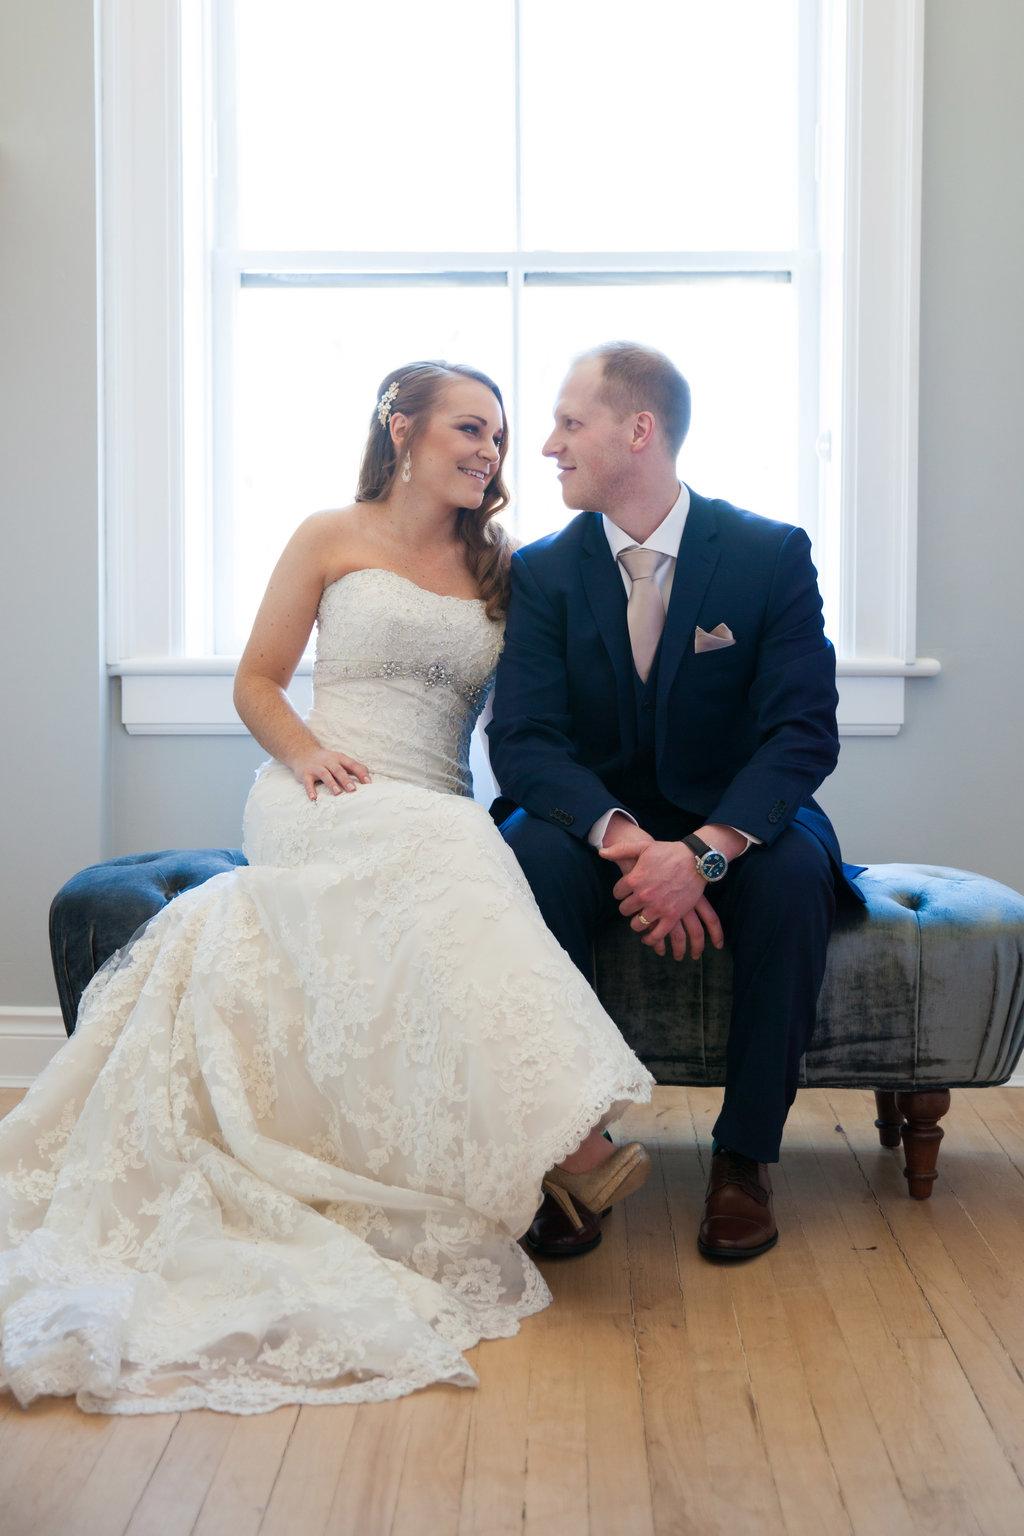 Chasing Autumn Photography,Medicine Hat Photography, Medicine Hat Wedding Photographer, Alberta Wedding Photographer, Beveridge Building Wedding, Monarch Theatre Wedding